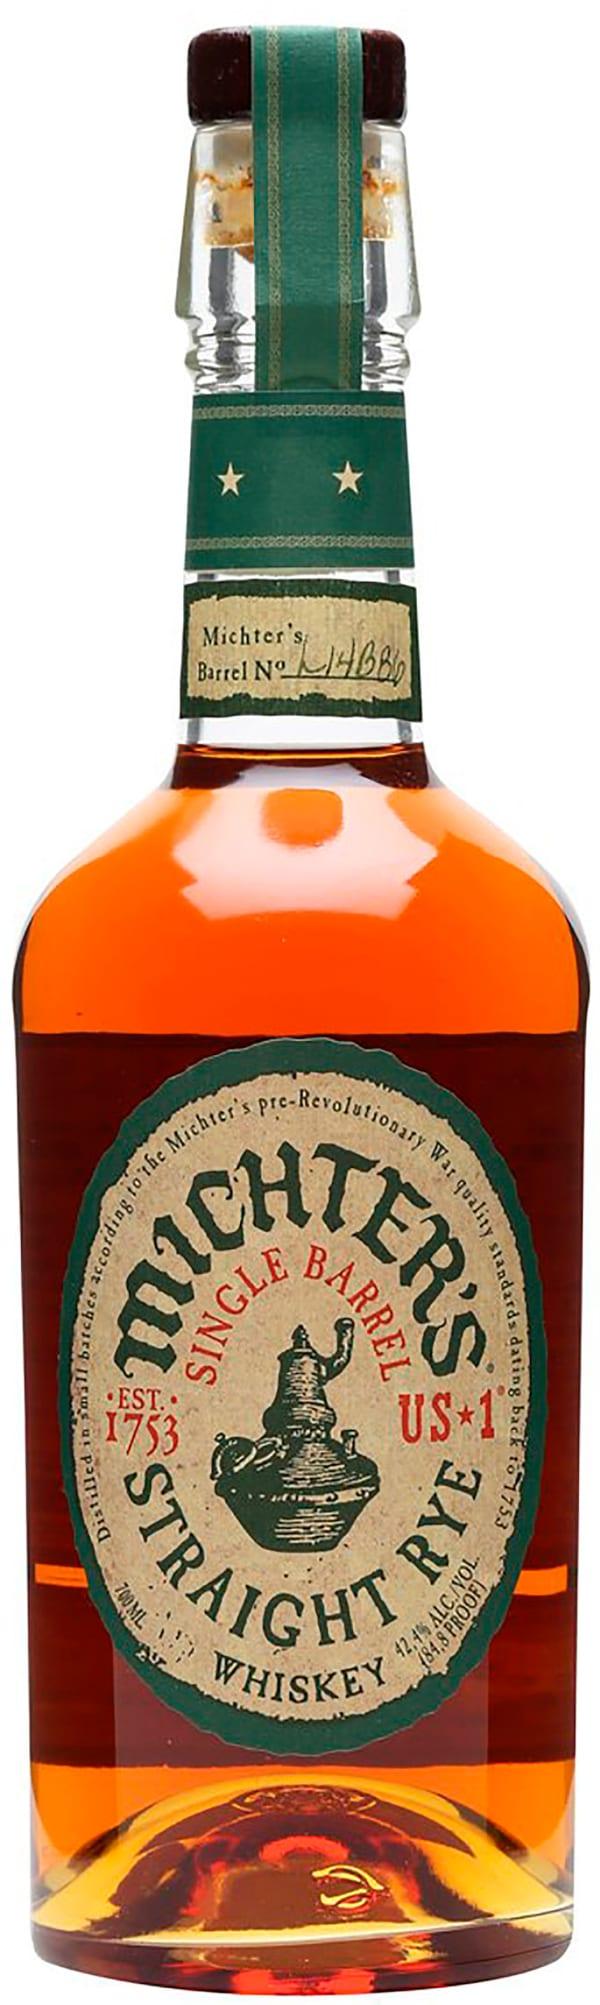 Michter's Single Barrel Kentucky Straight Rye